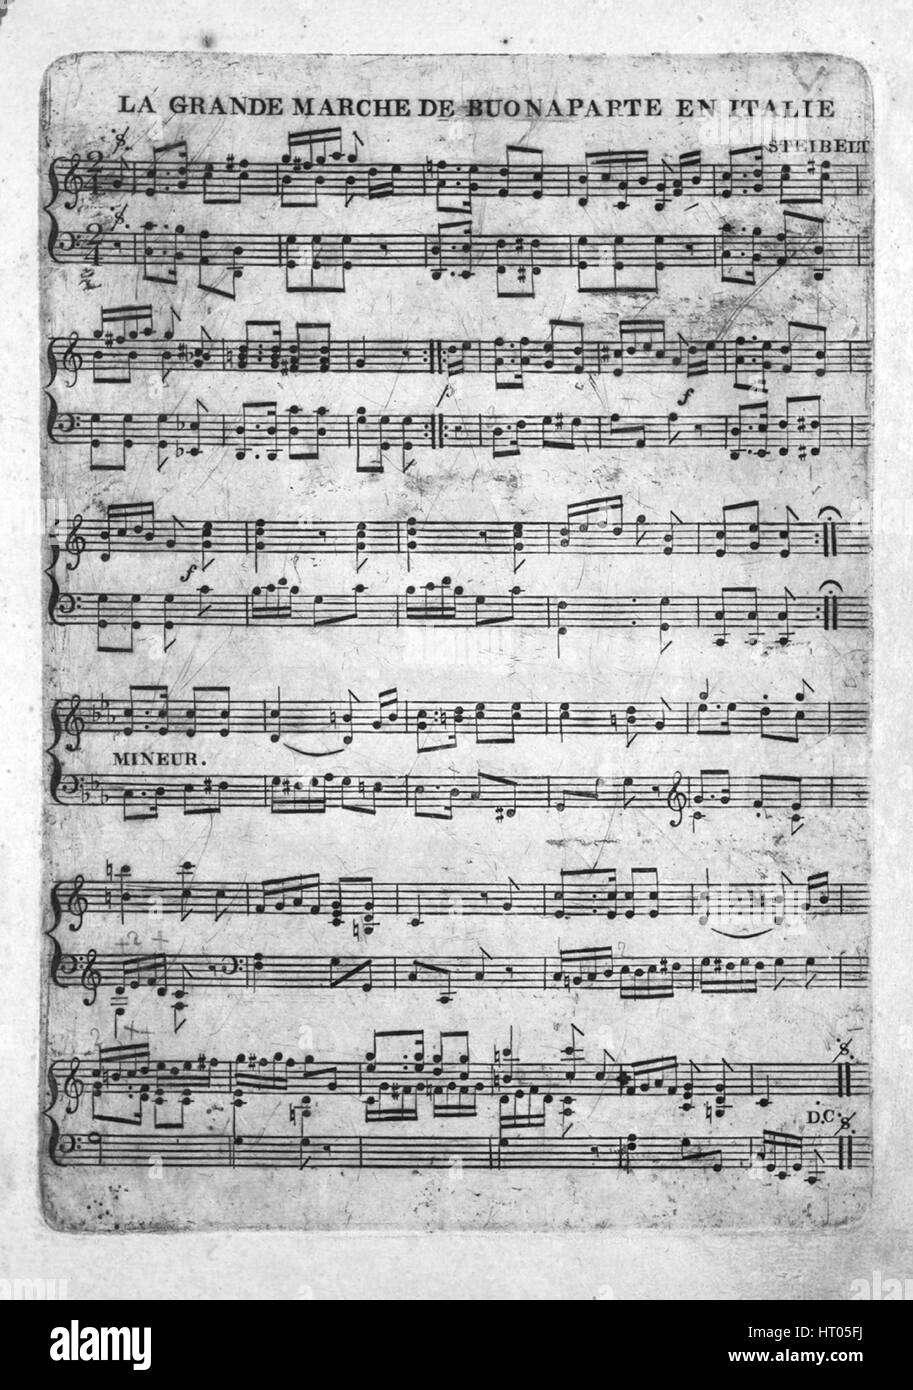 Sheet music cover image of the song 'La Grande Marche de Buonaparte en Italie', with original authorship notes reading Stock Photo